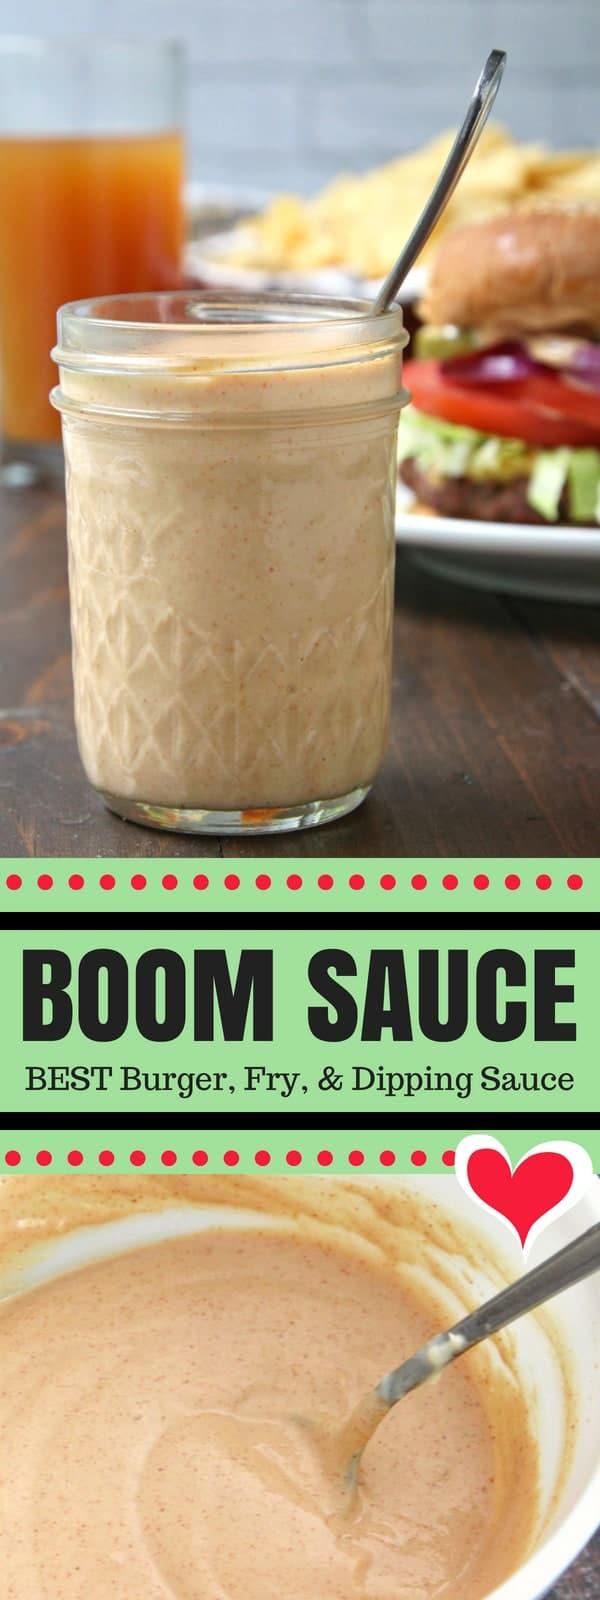 Boom Sauce Recipe - easy burger, fry, & dipping sauce